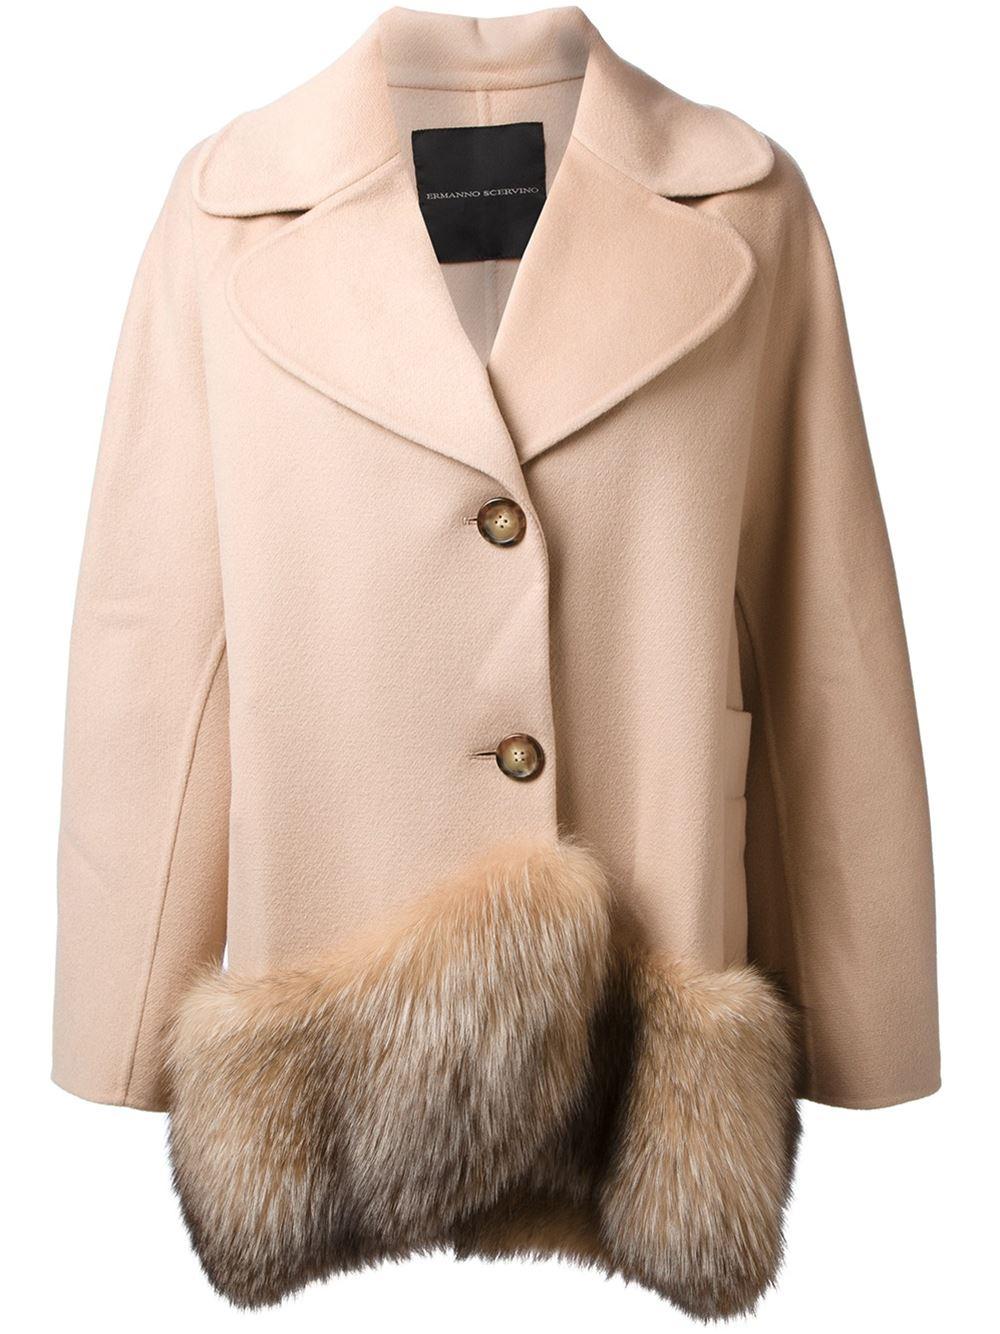 on sale 58736 ddce0 Ermanno Scervino Fox Fur Trimmed Coat in Natural - Lyst